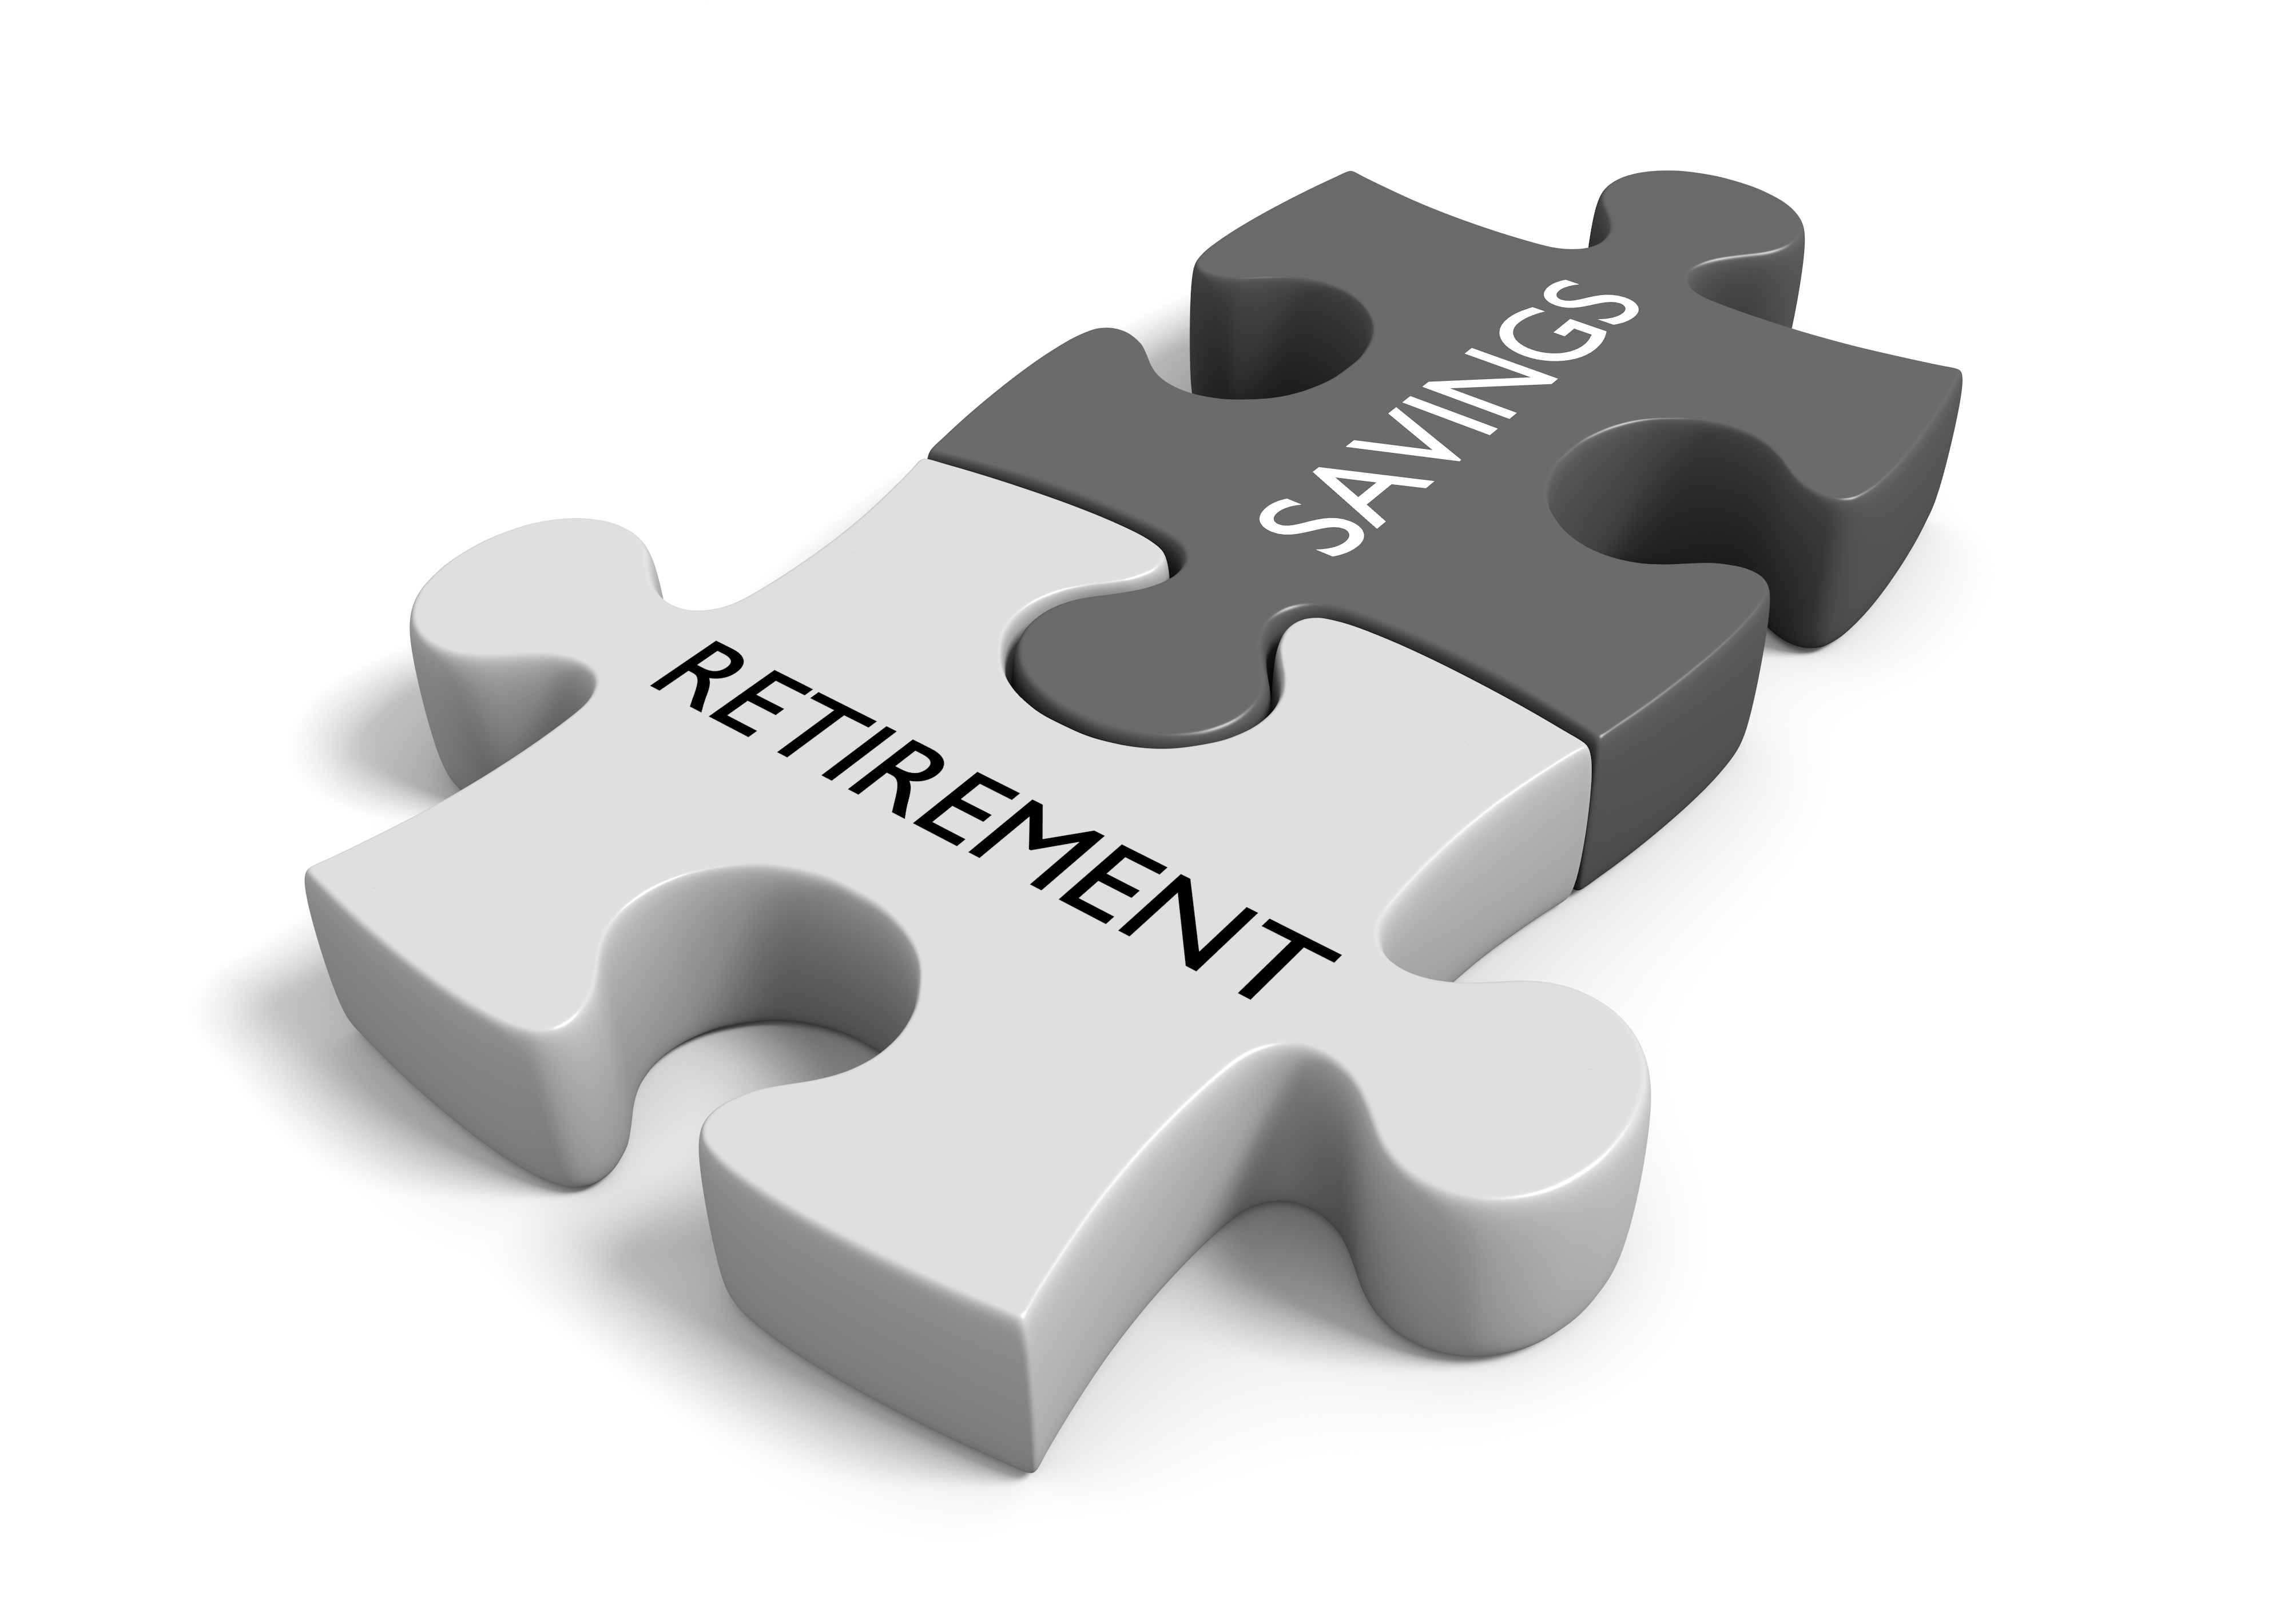 Retirement Redux | How to reform retirement savings